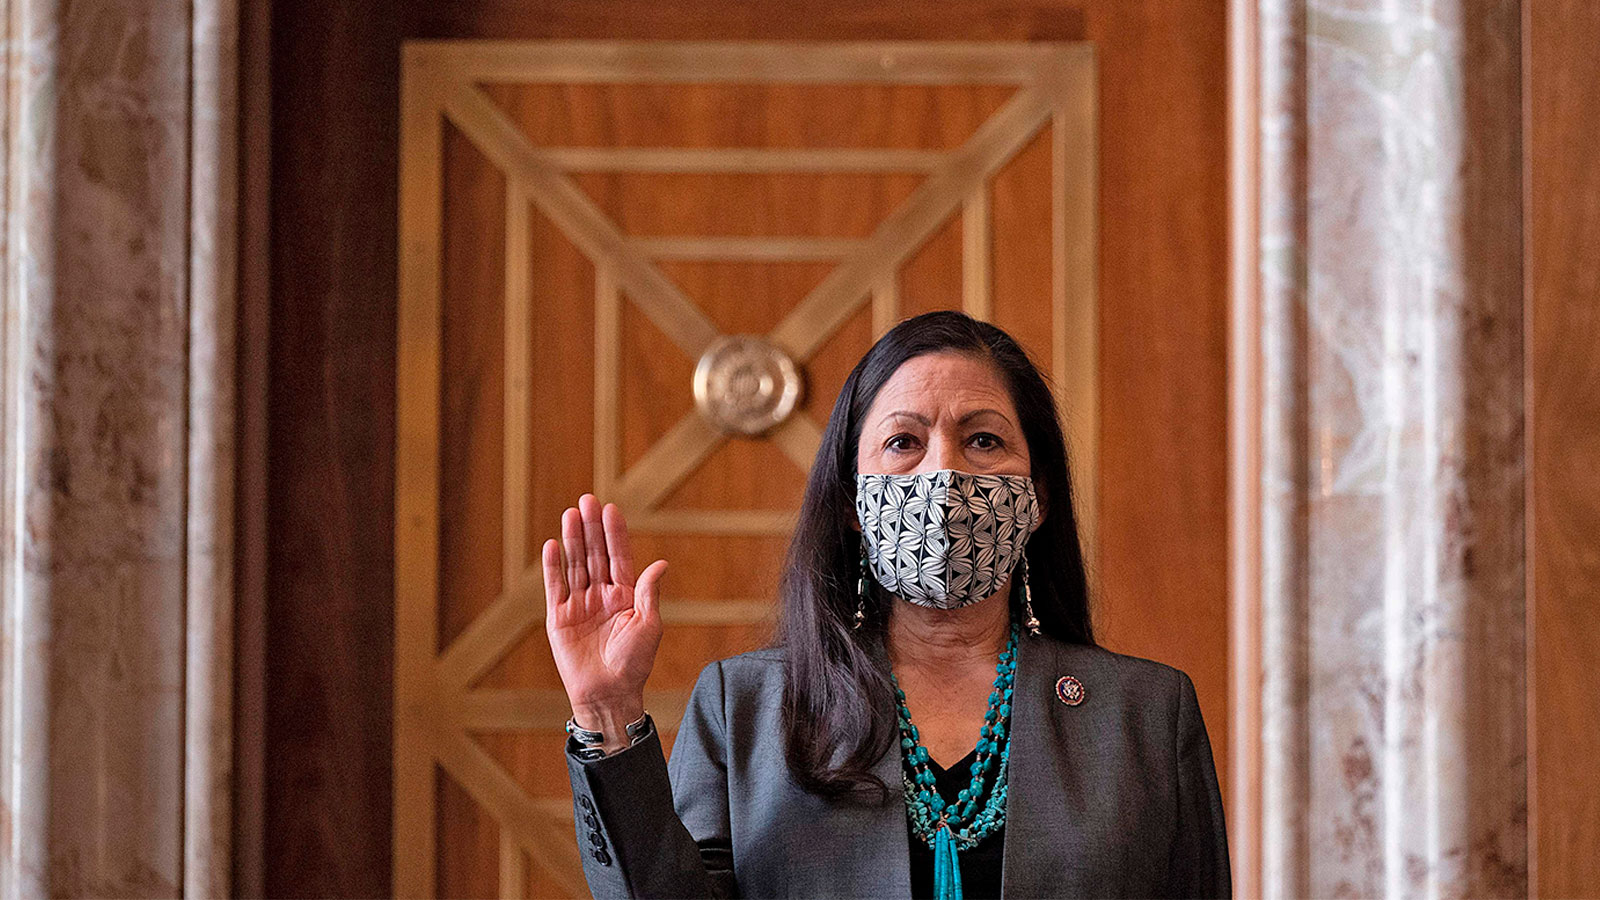 Deb Haaland isn't as 'radical' as some Republican senators think